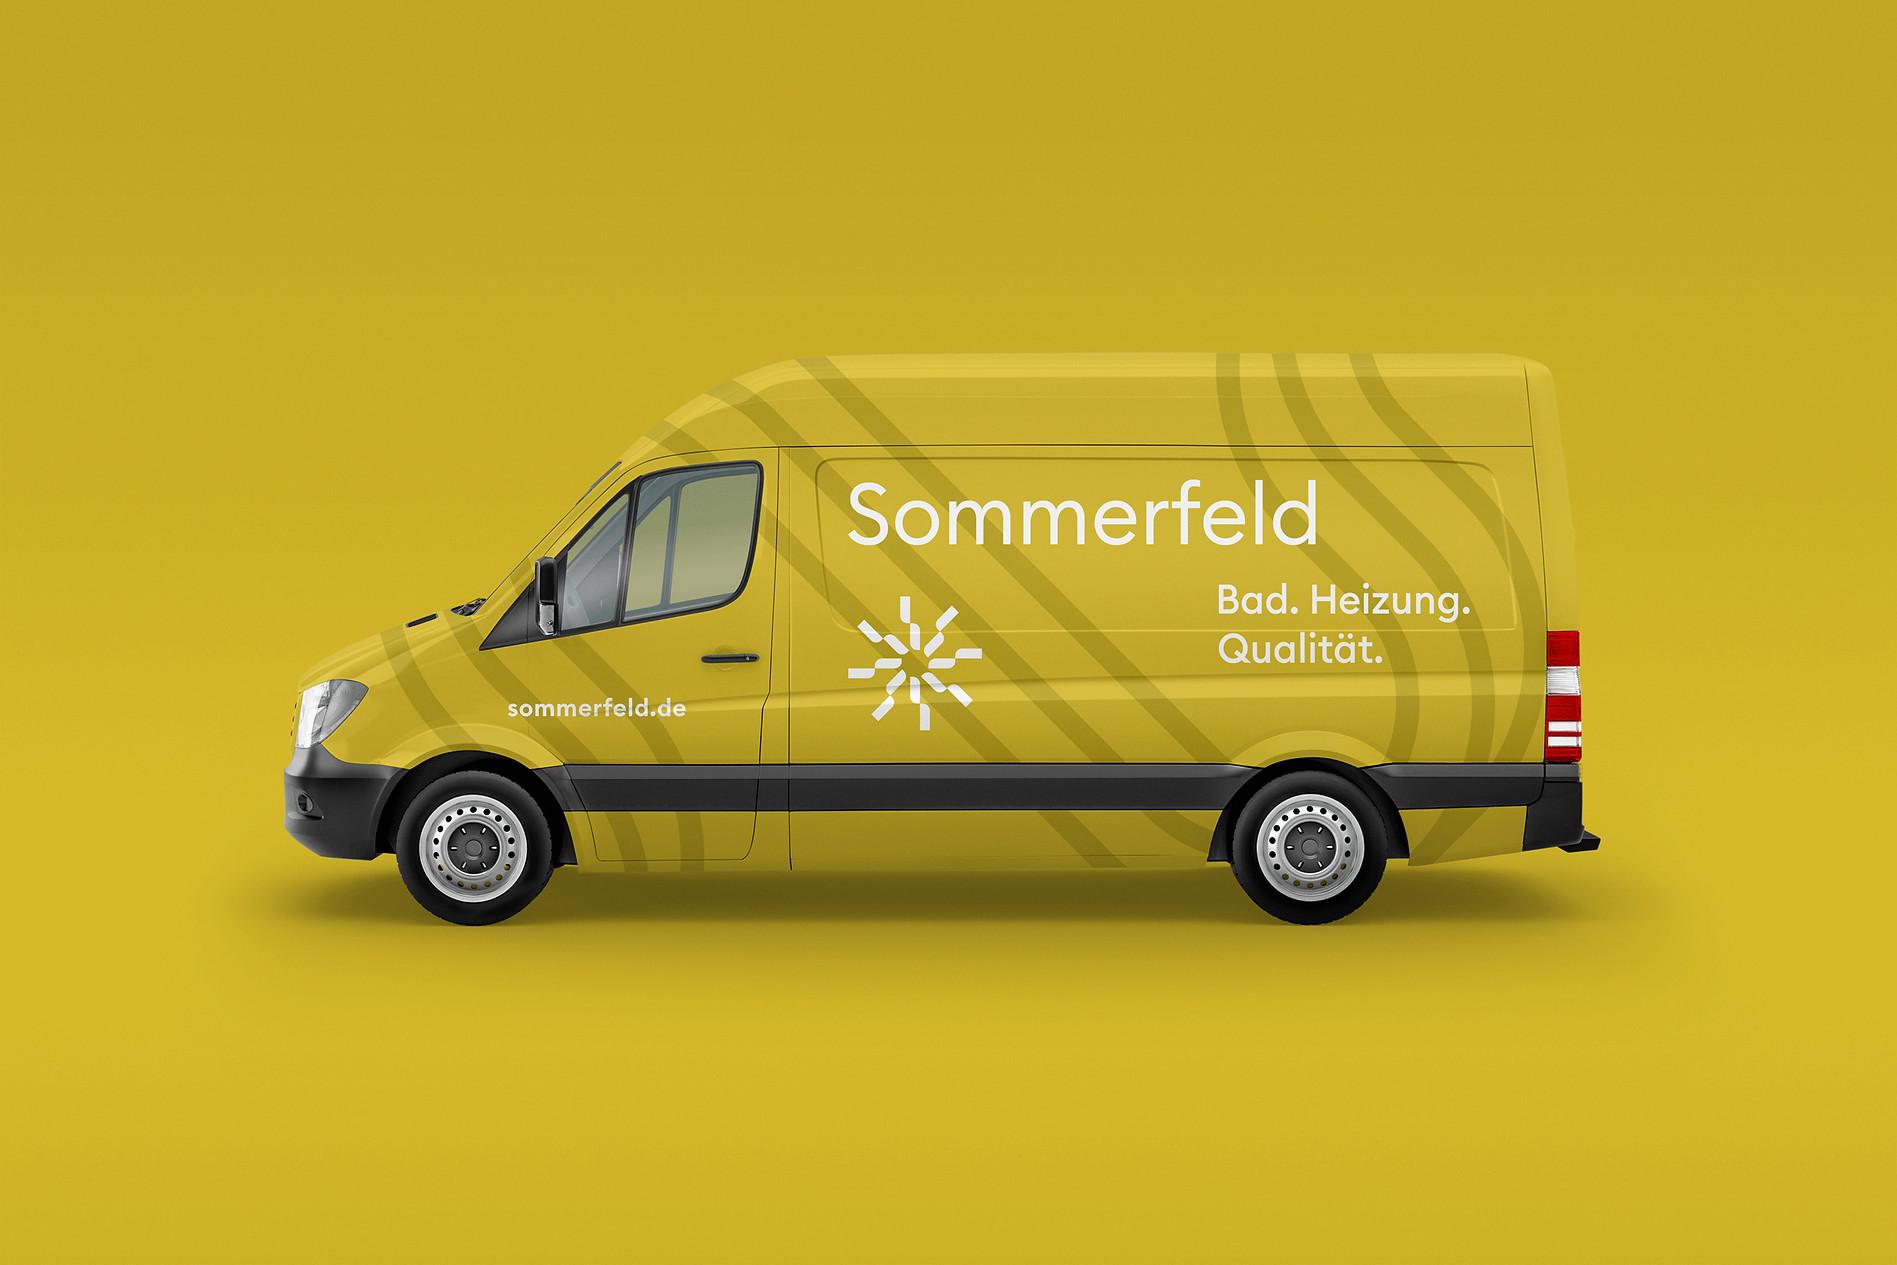 sl_Sommerfeld_15.jpg